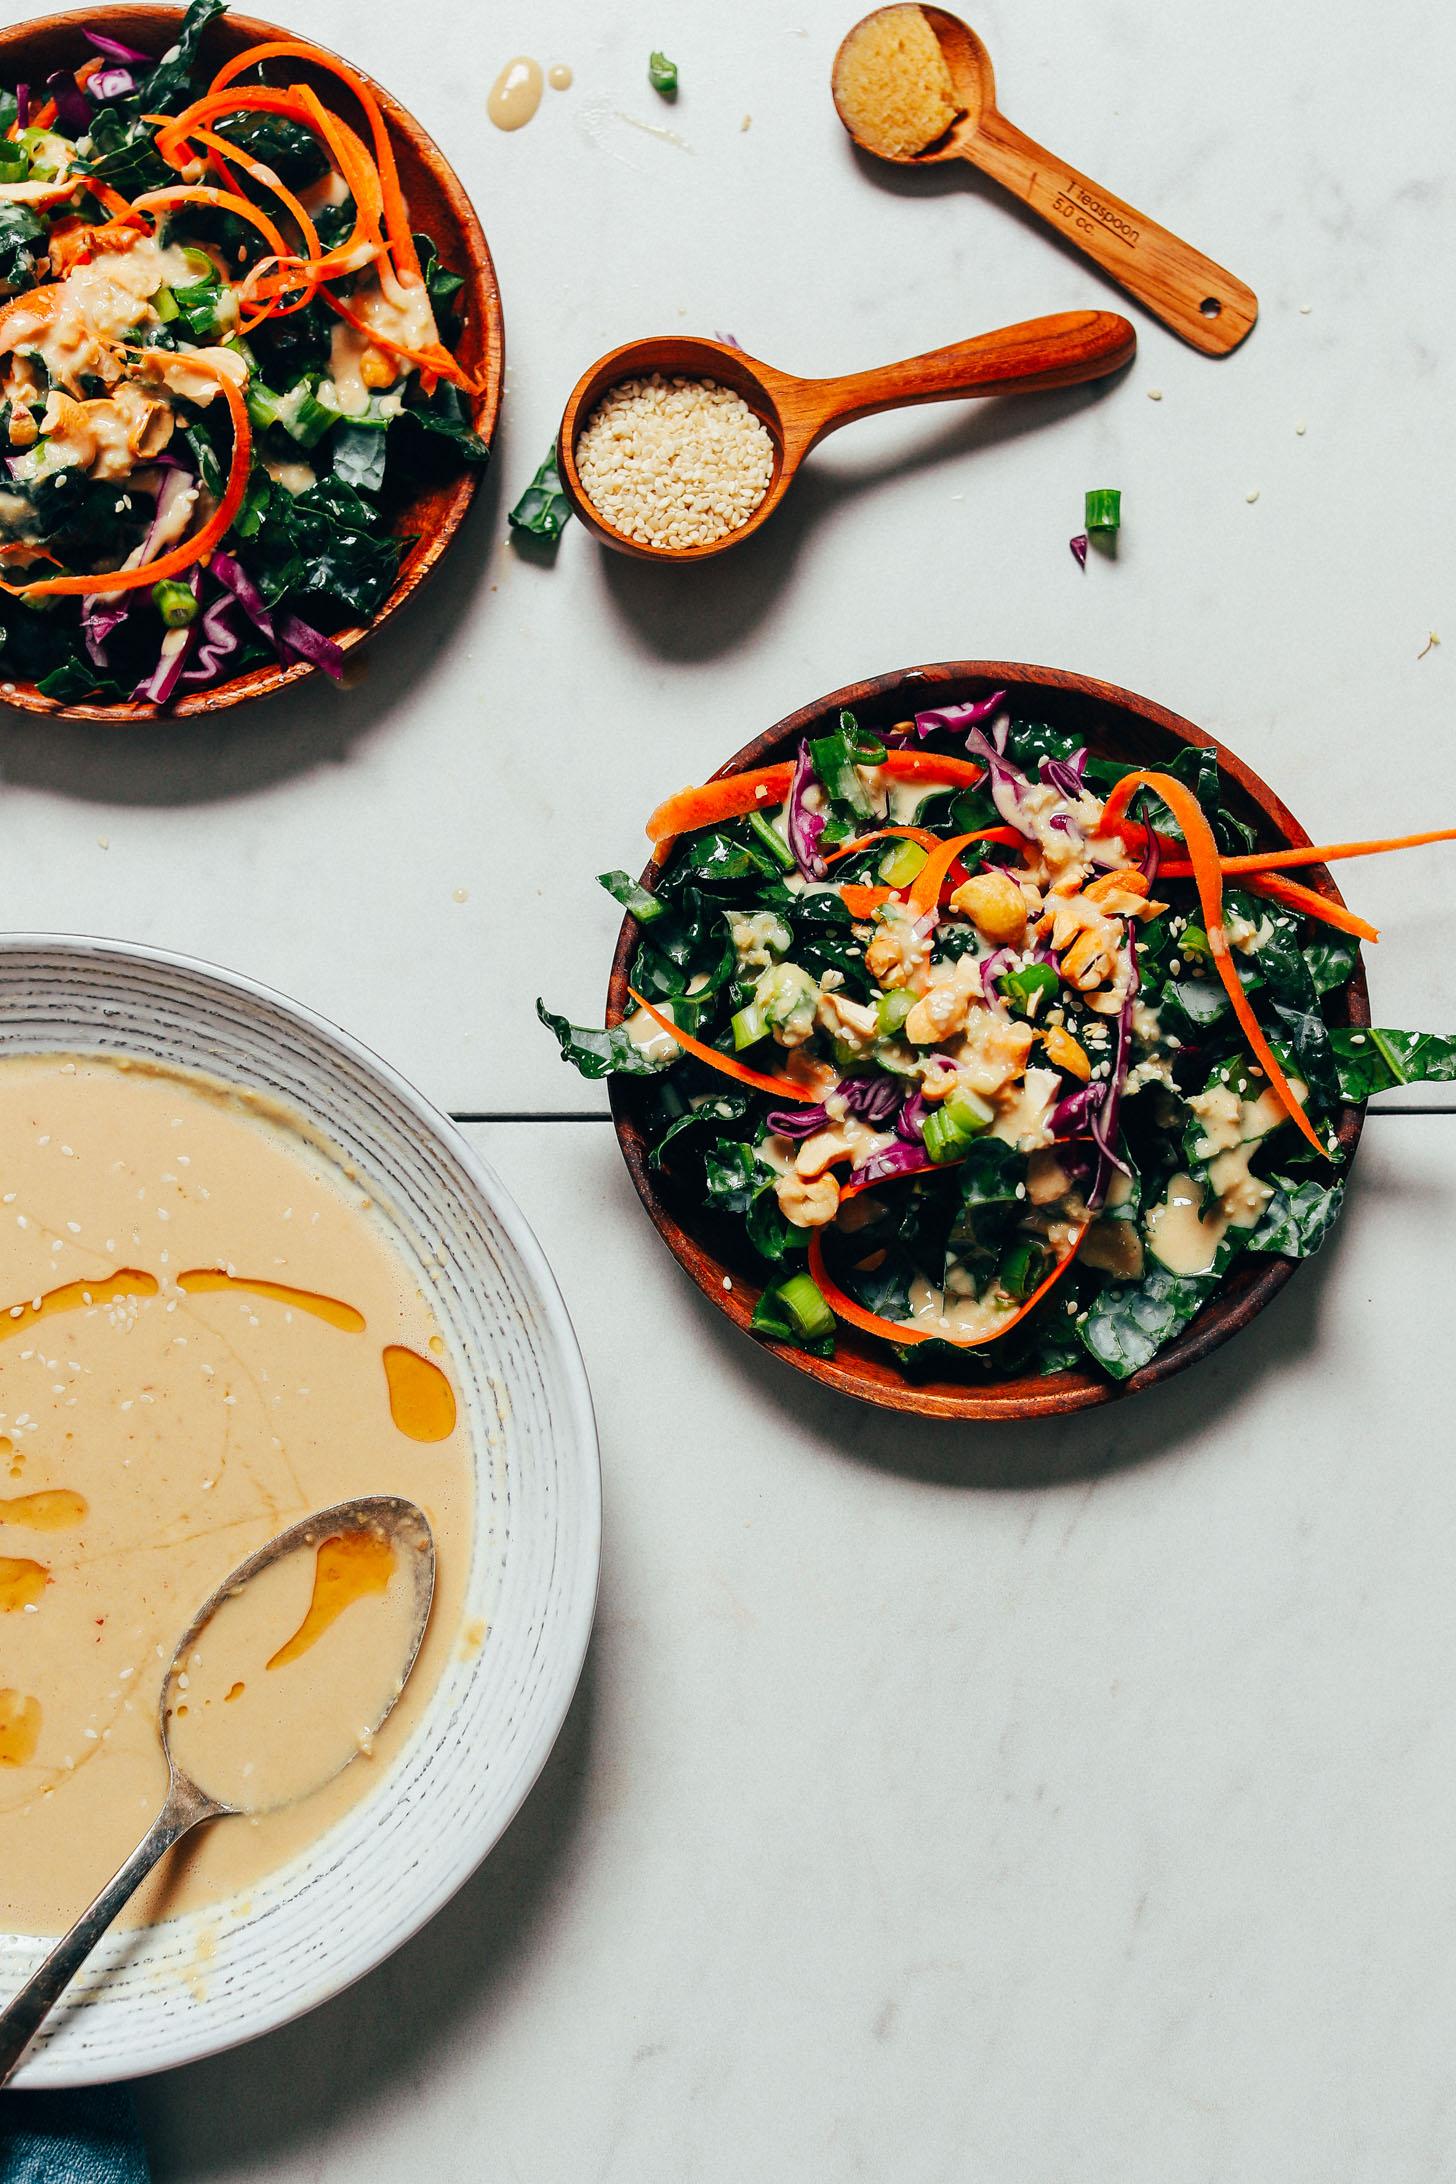 vegan dressing - vegan dressing recepten - dressing recepten - vegan salades